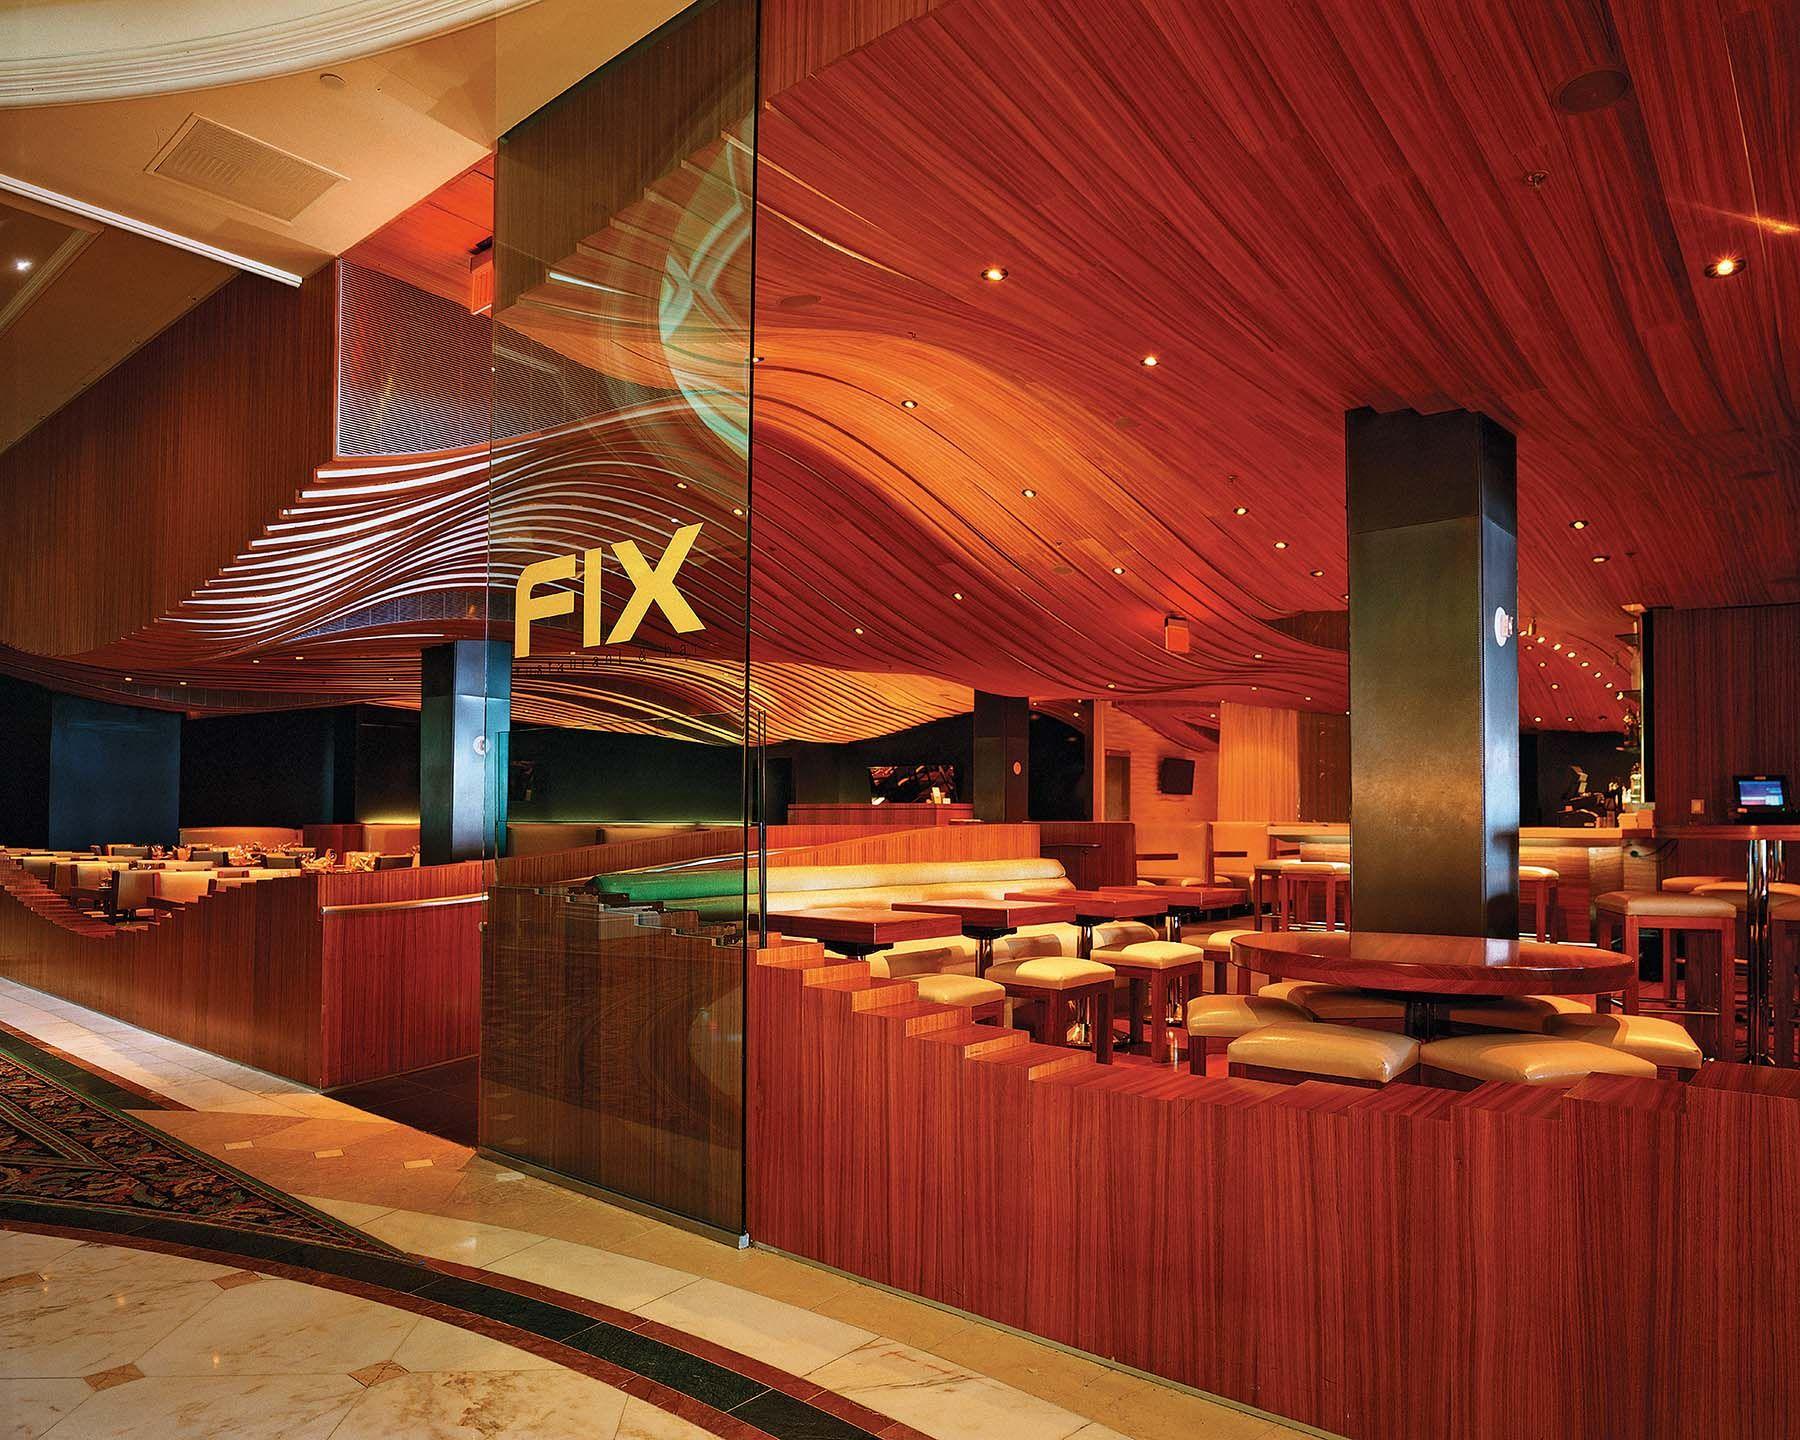 Fix Restaurant